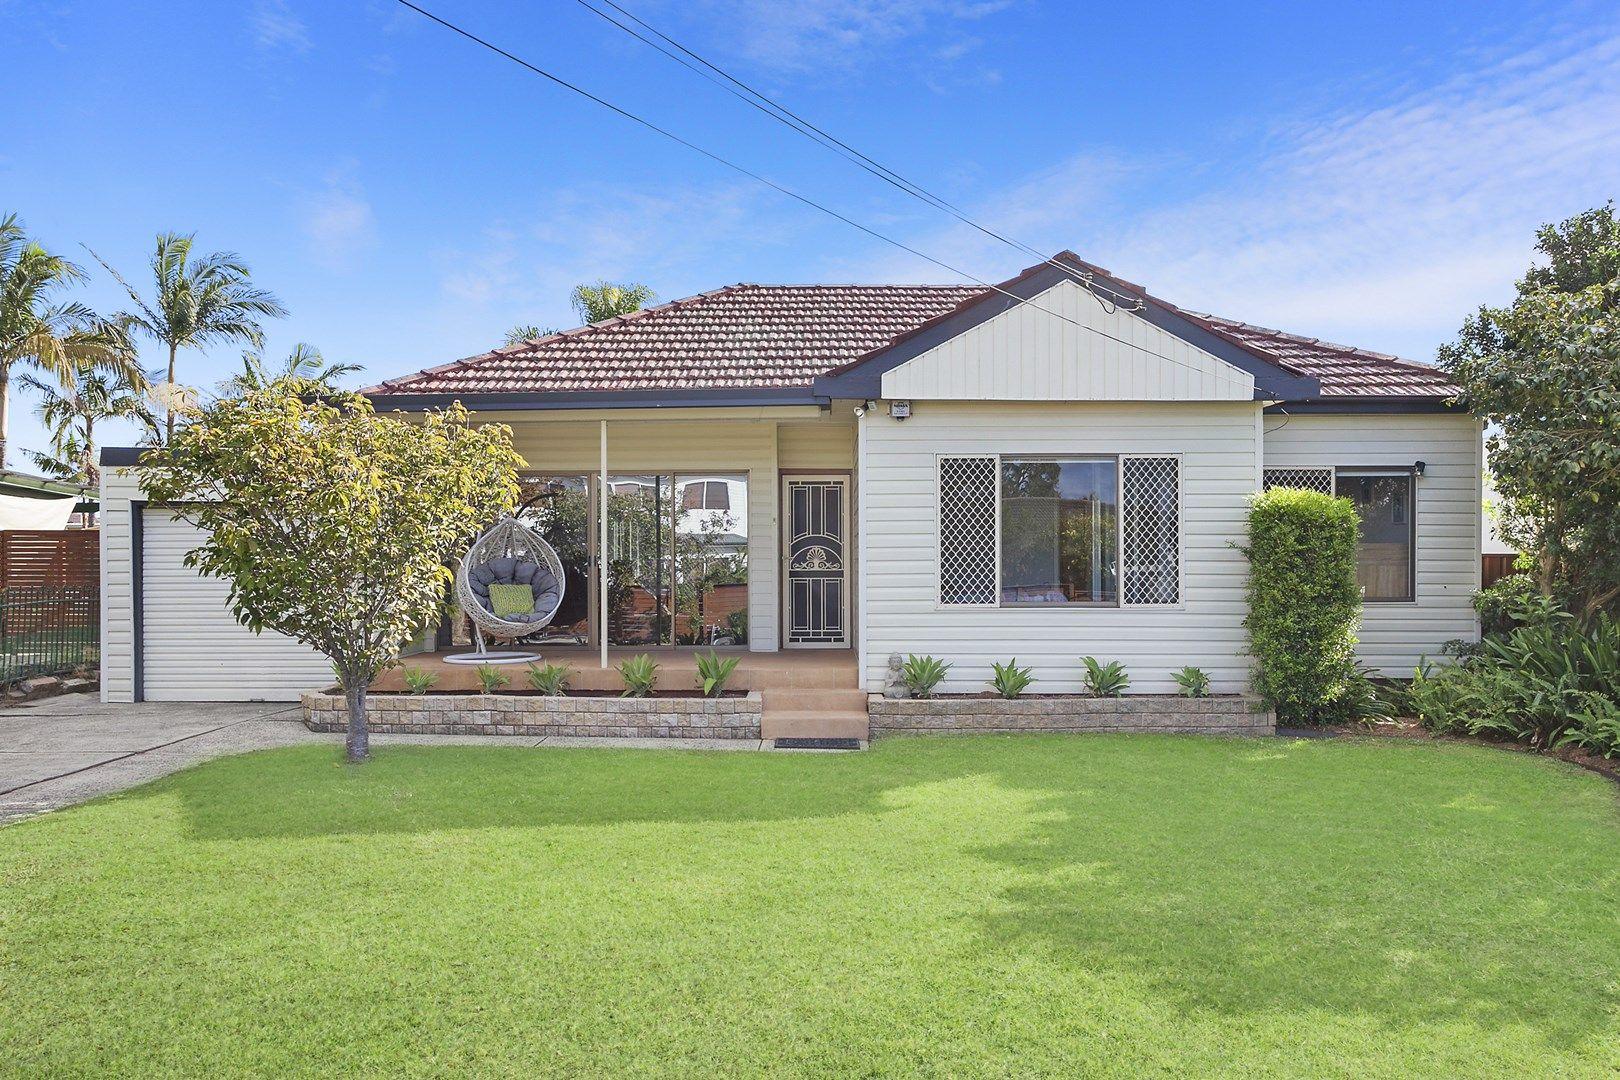 173 Cooriengah Heights Road, Engadine NSW 2233, Image 0